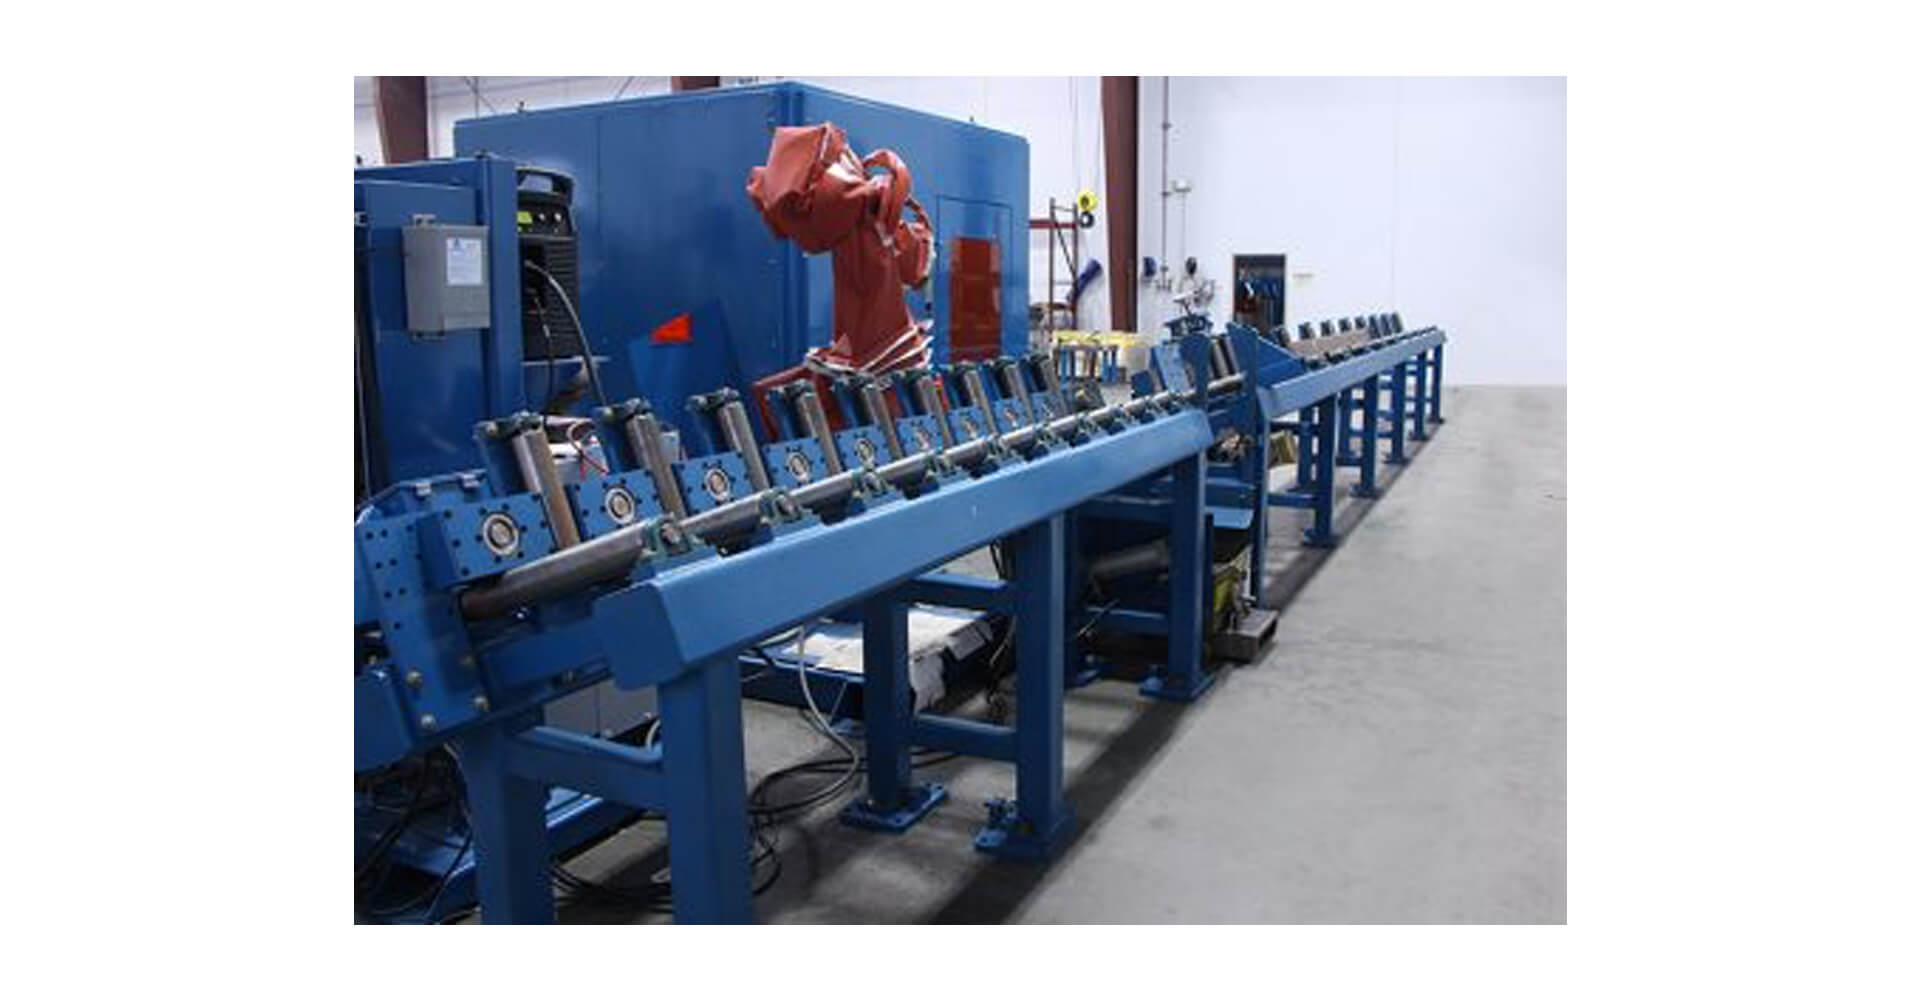 RPAC-1000_Robotic Plasma Cutting Machine with Conveyor